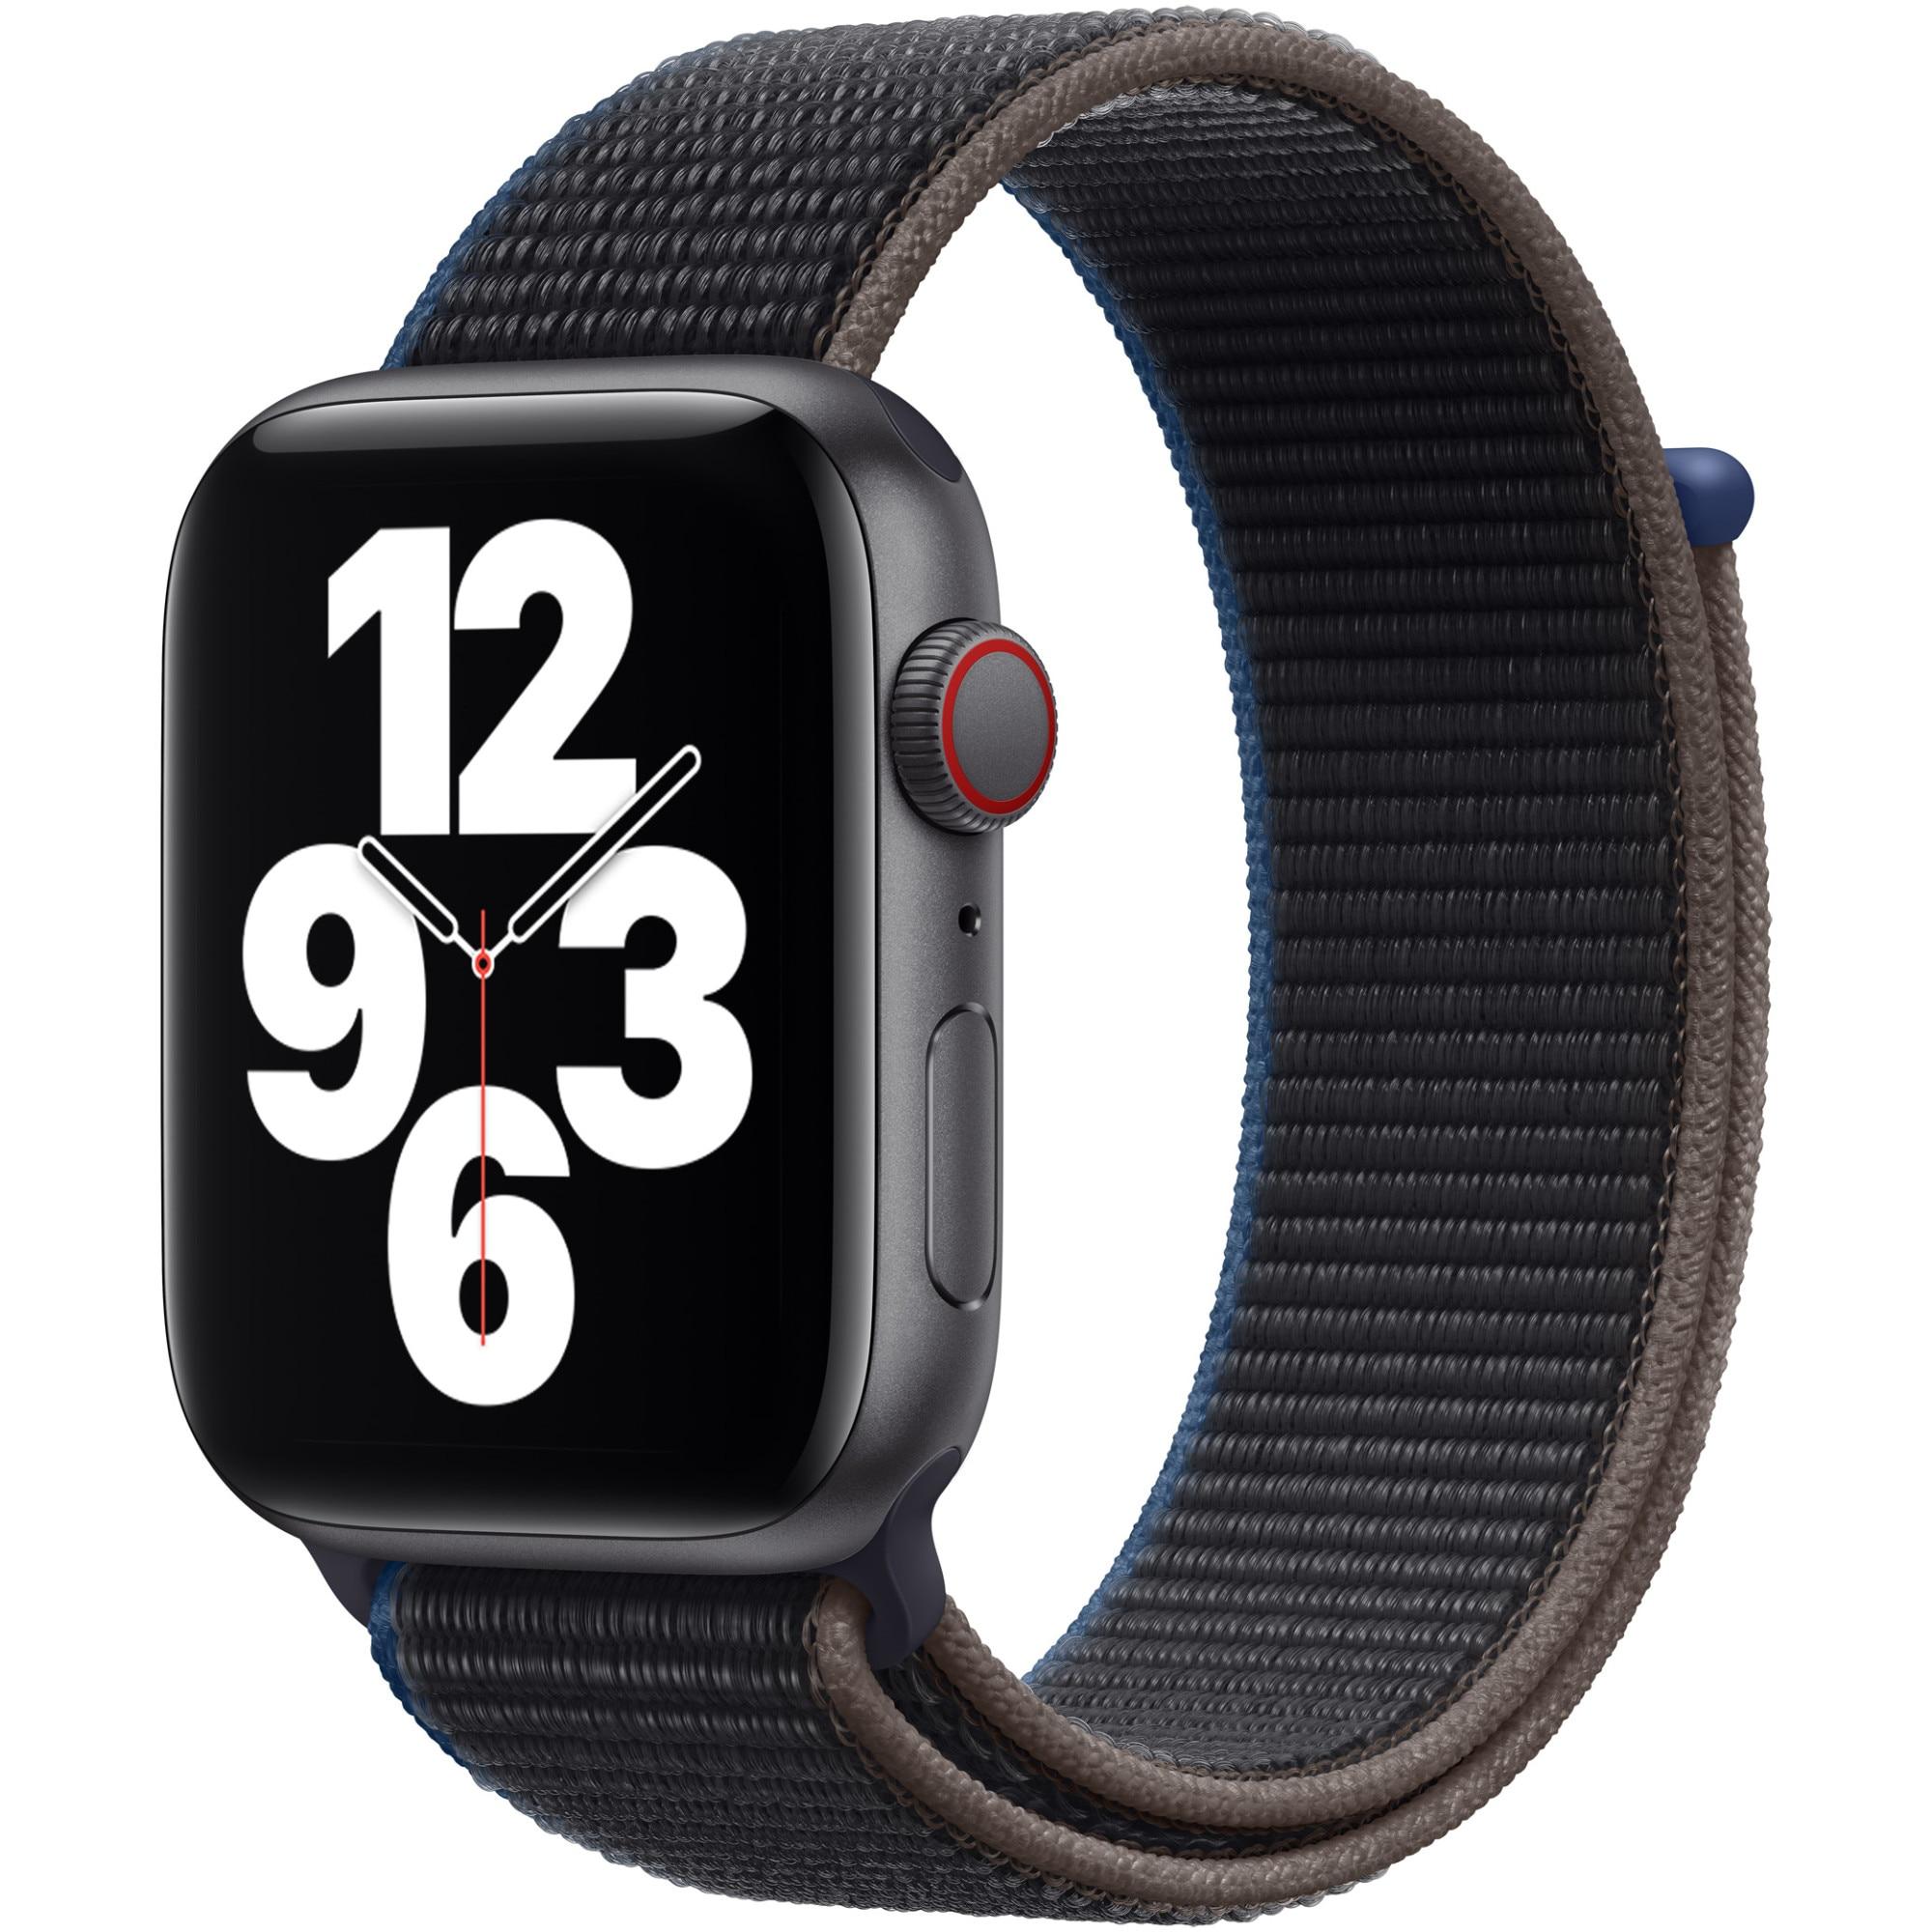 Fotografie Apple Watch SE, GPS, Cellular, Carcasa Space Gray Aluminium 44mm, Charcoal Sport Loop